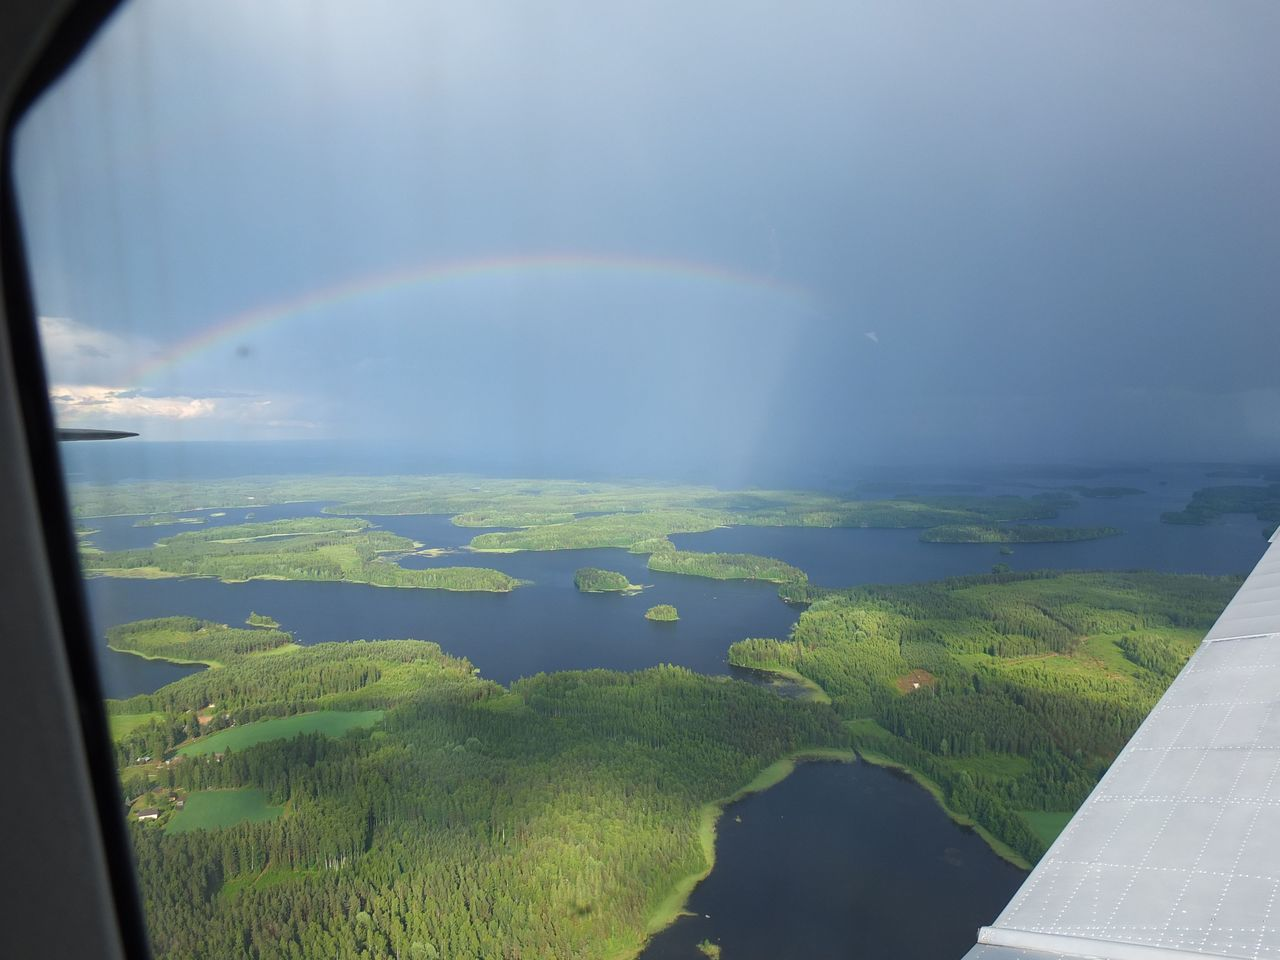 Радуга над озером Саймаа в Финляндии